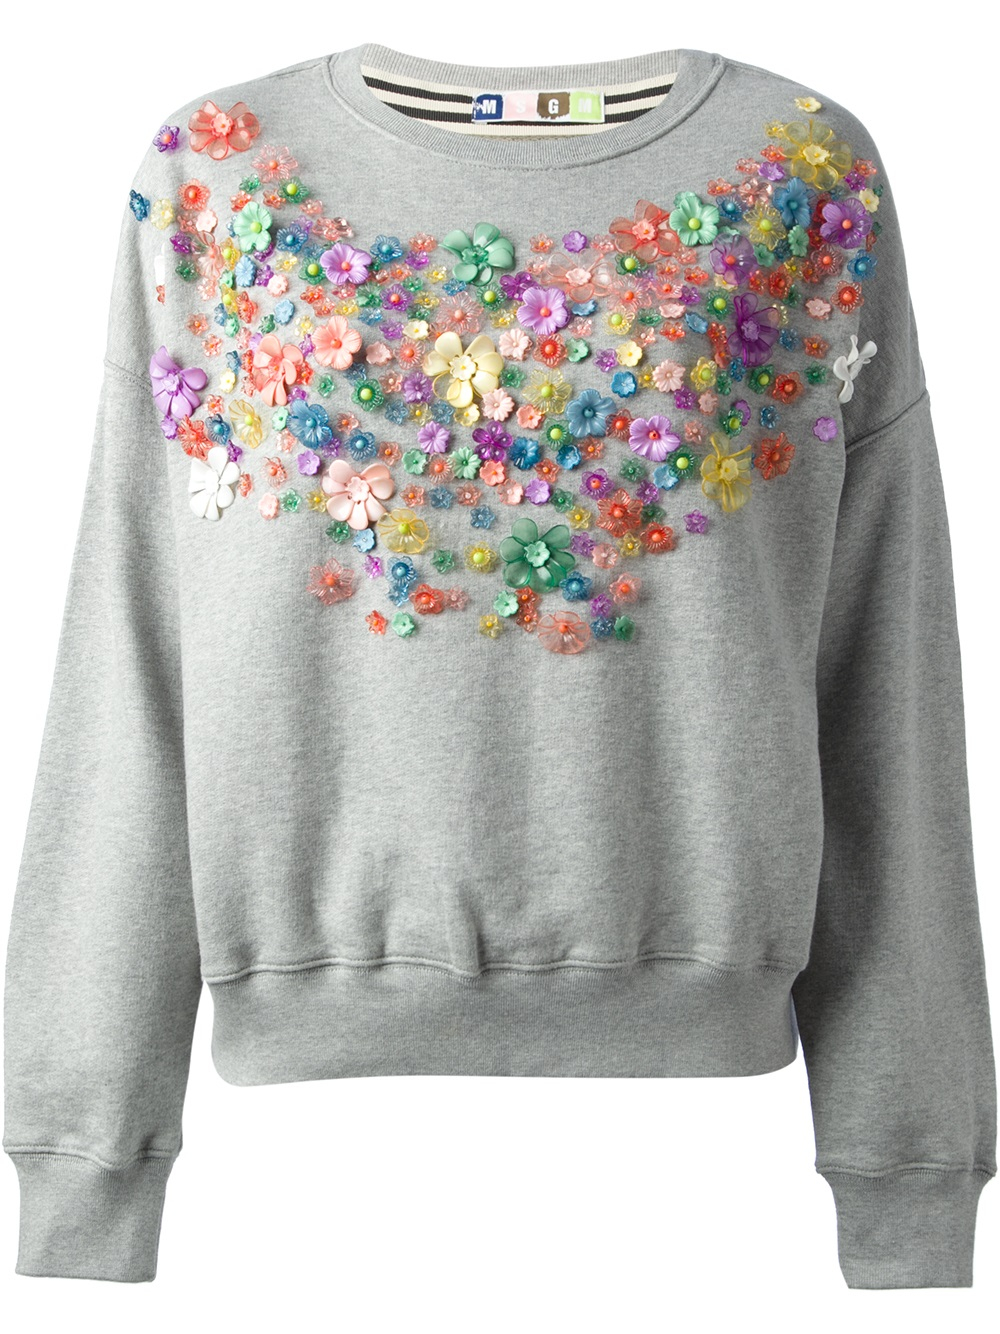 Gray Crew Neck Sweater Women S